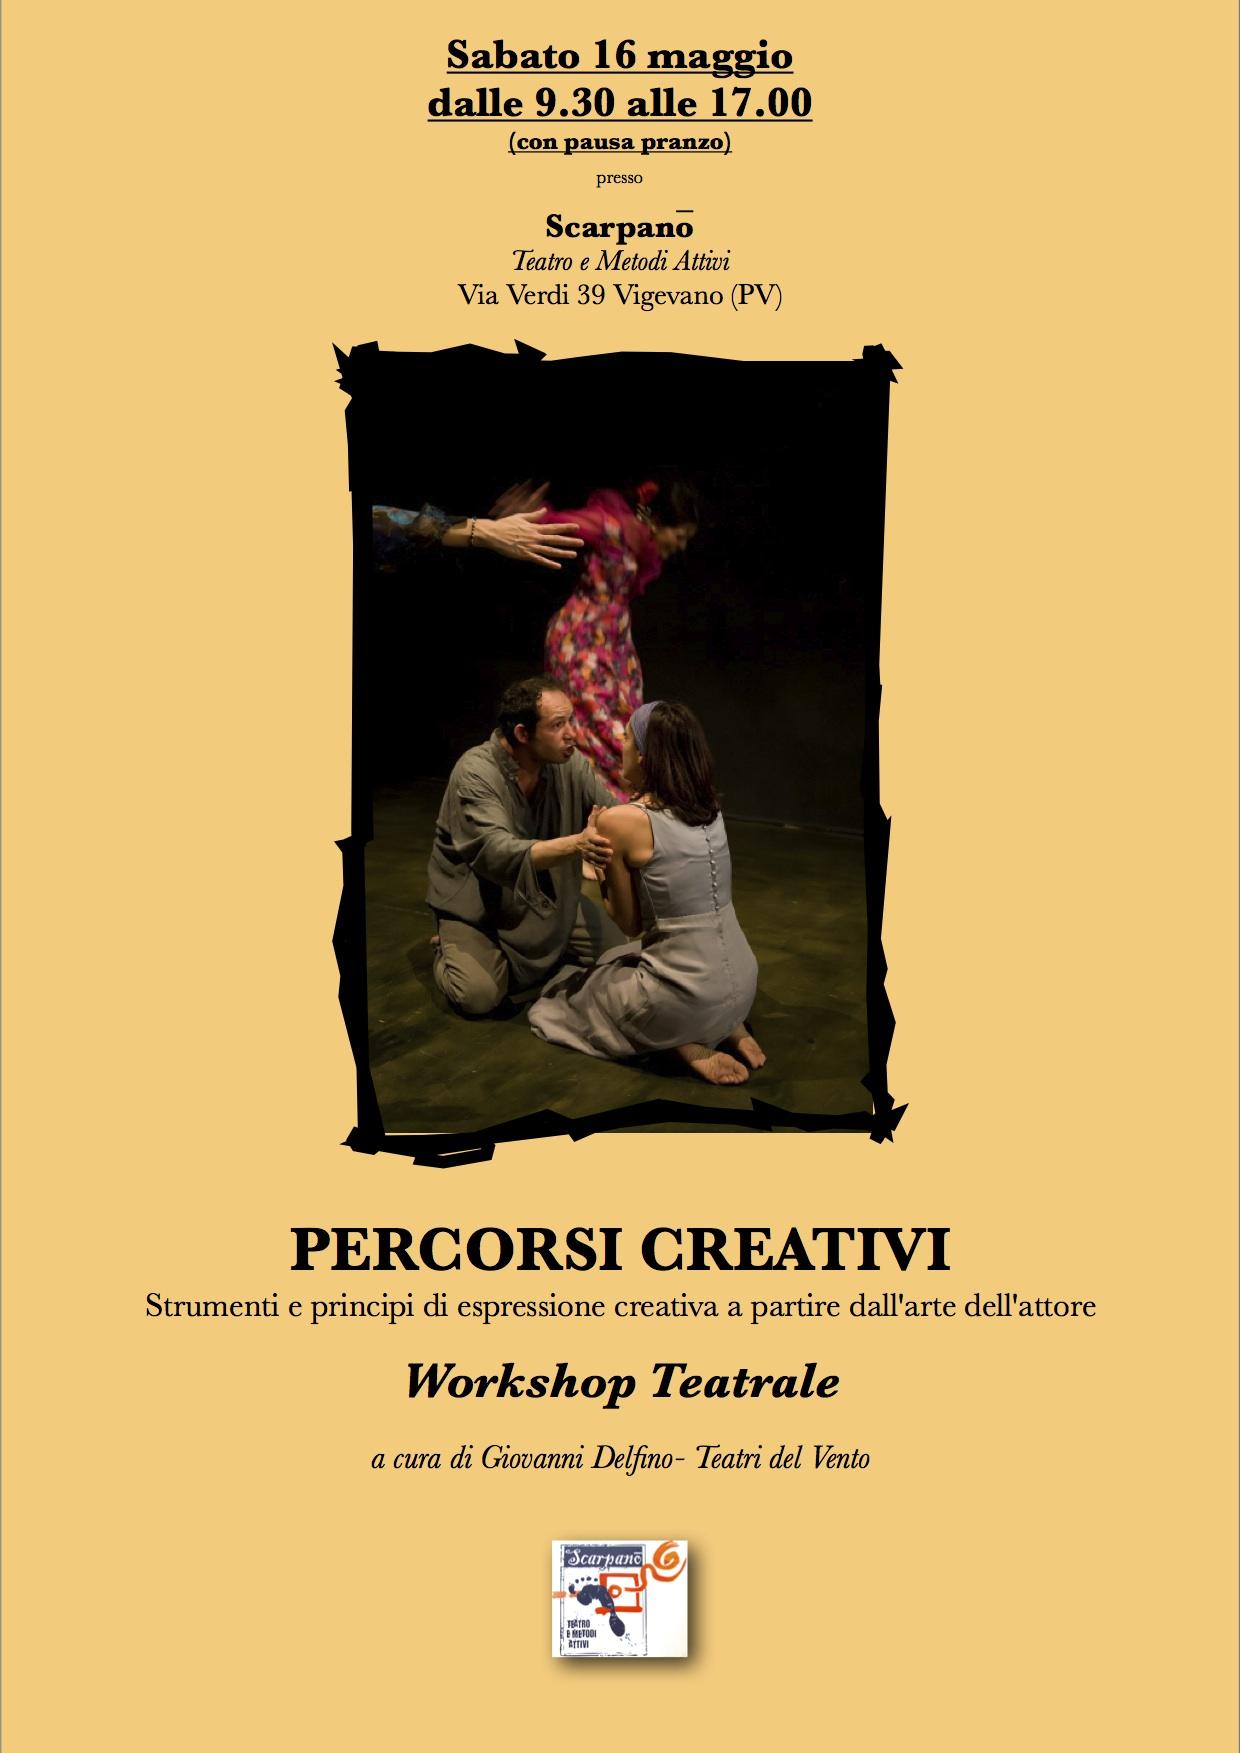 workshop teatri del vento locandina